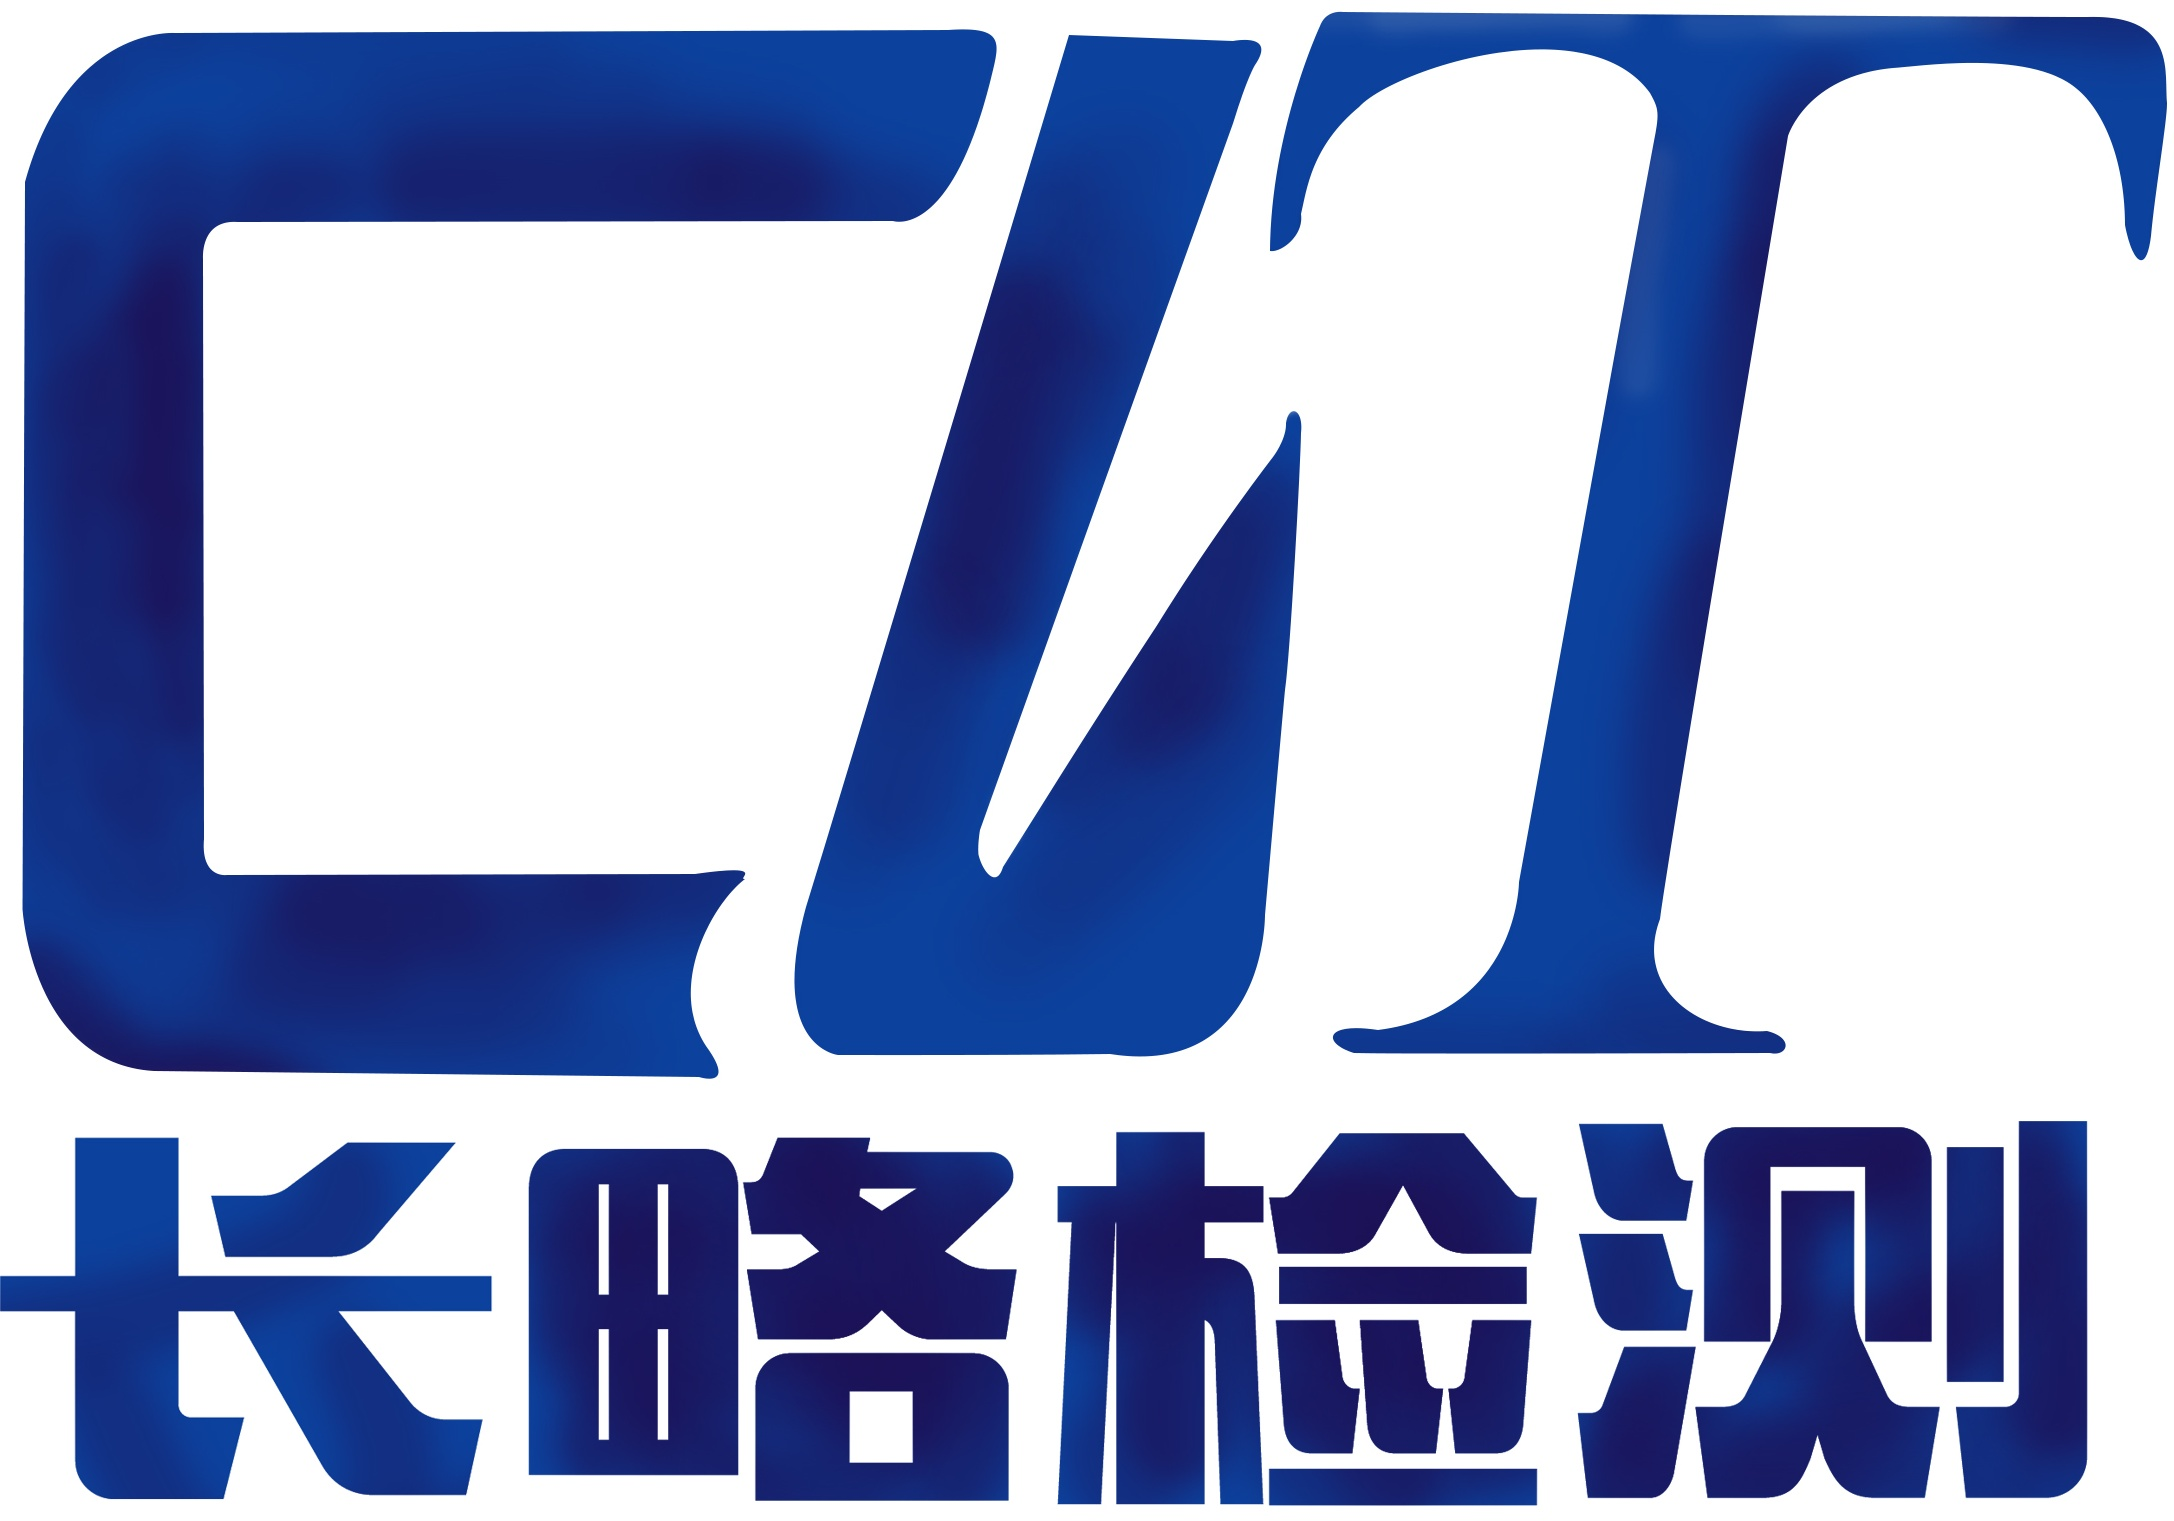 TUV认证介绍 TUV (Technischer überwachungs-Verein,德语意为技术监督协会):英语表达为Technical Inspection Association。目前德国规模最大全球认可度最高的TüV为TüV莱茵集团(TUVRheinland)及TüV南德集团,是德国政府公认的检验机构,也是与FCC、CE、CSA和UL并列的权威认证机构,凡是销往德国的产品,其安全使用标准必须经过TüV认证。 TUV应用安全标准的目的是:防止家电